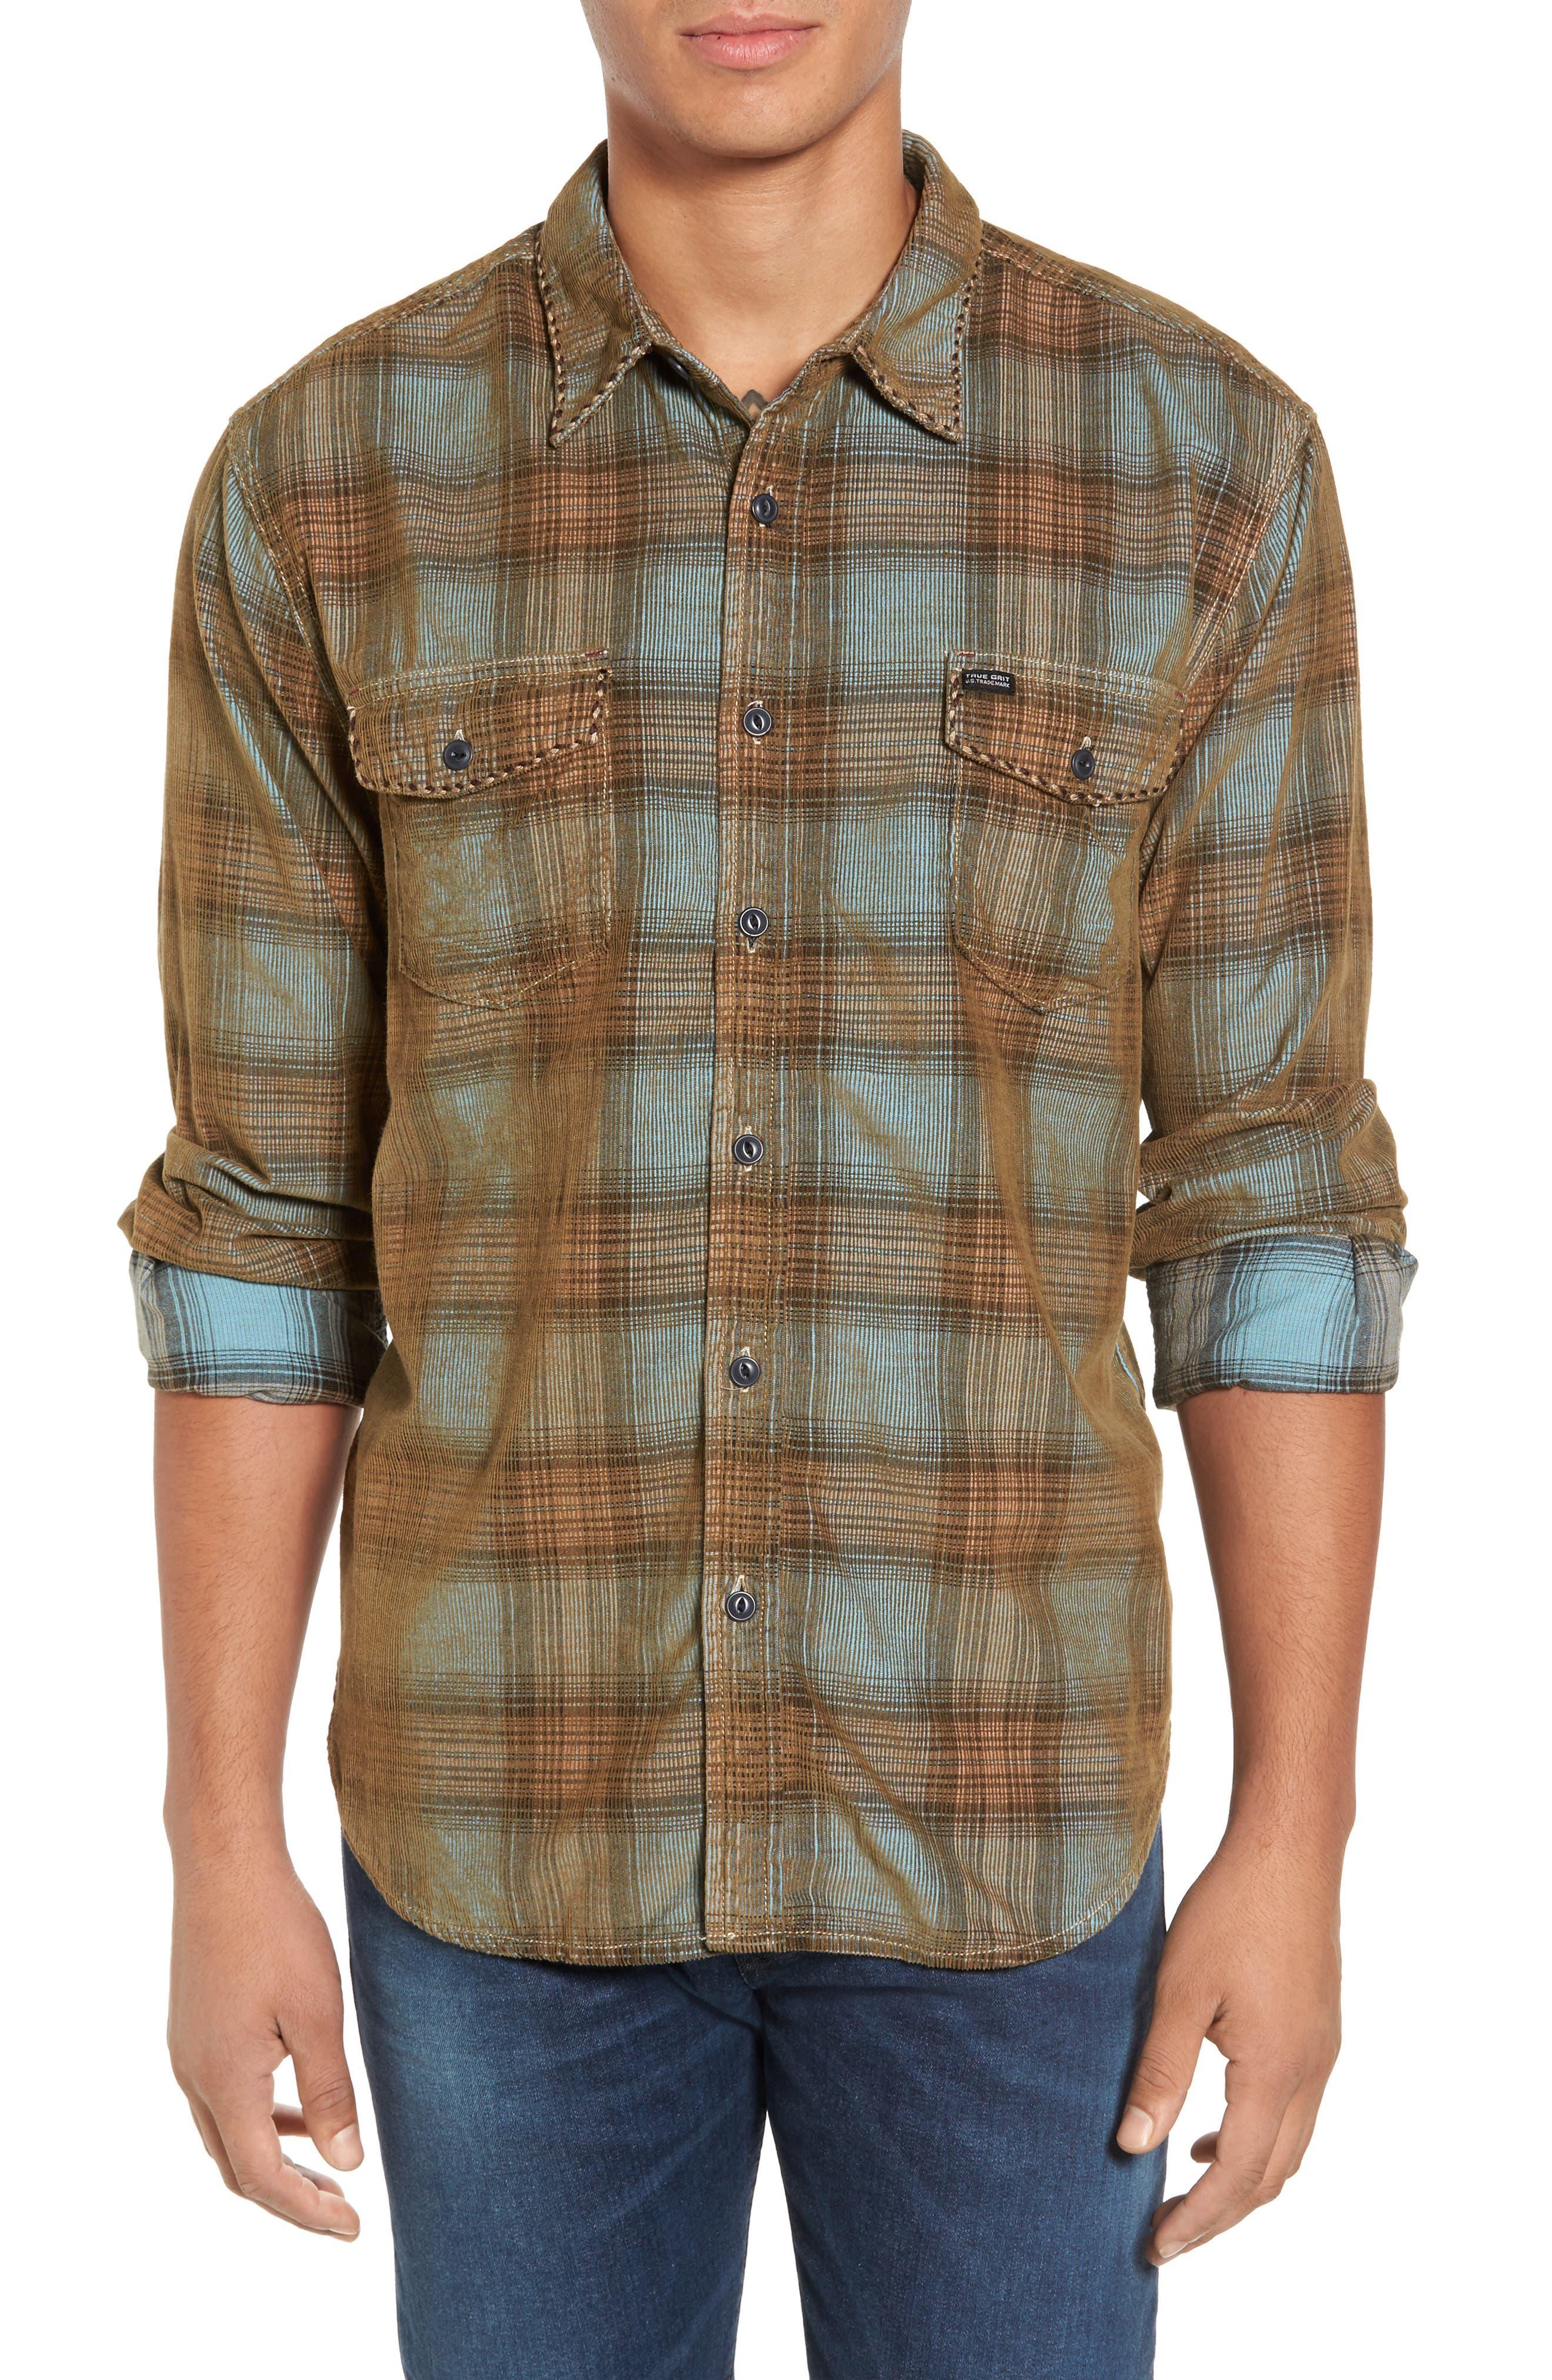 Alternate Image 1 Selected - True Grit Ventura Vintage Slim Fit Plaid Corduroy Shirt